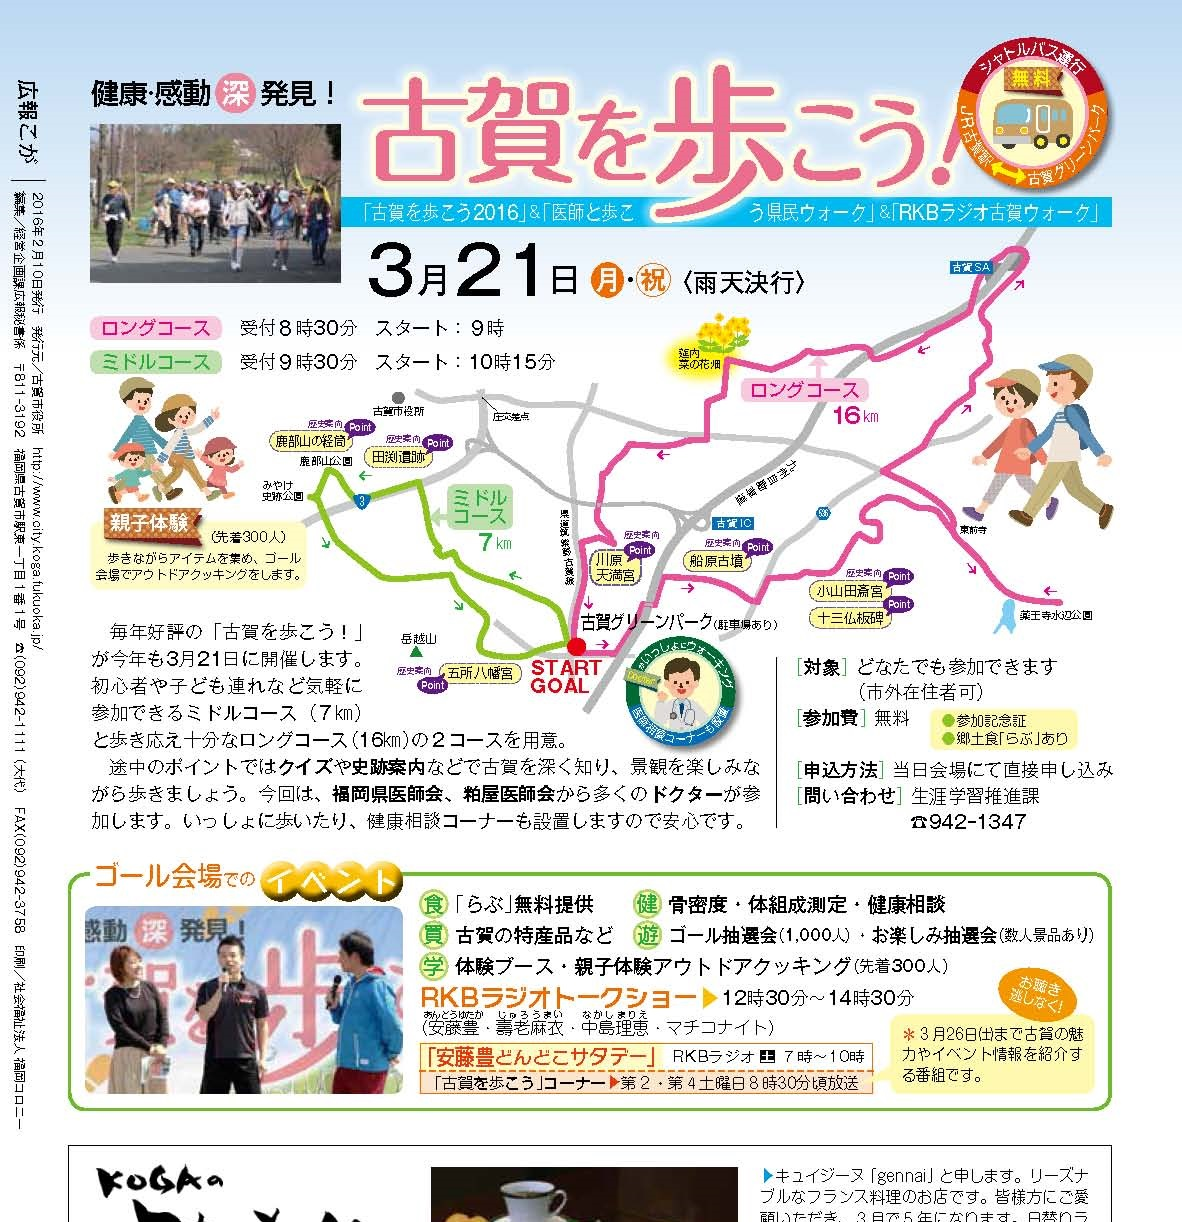 古賀市広報誌2016年3月号_ページ_11_B